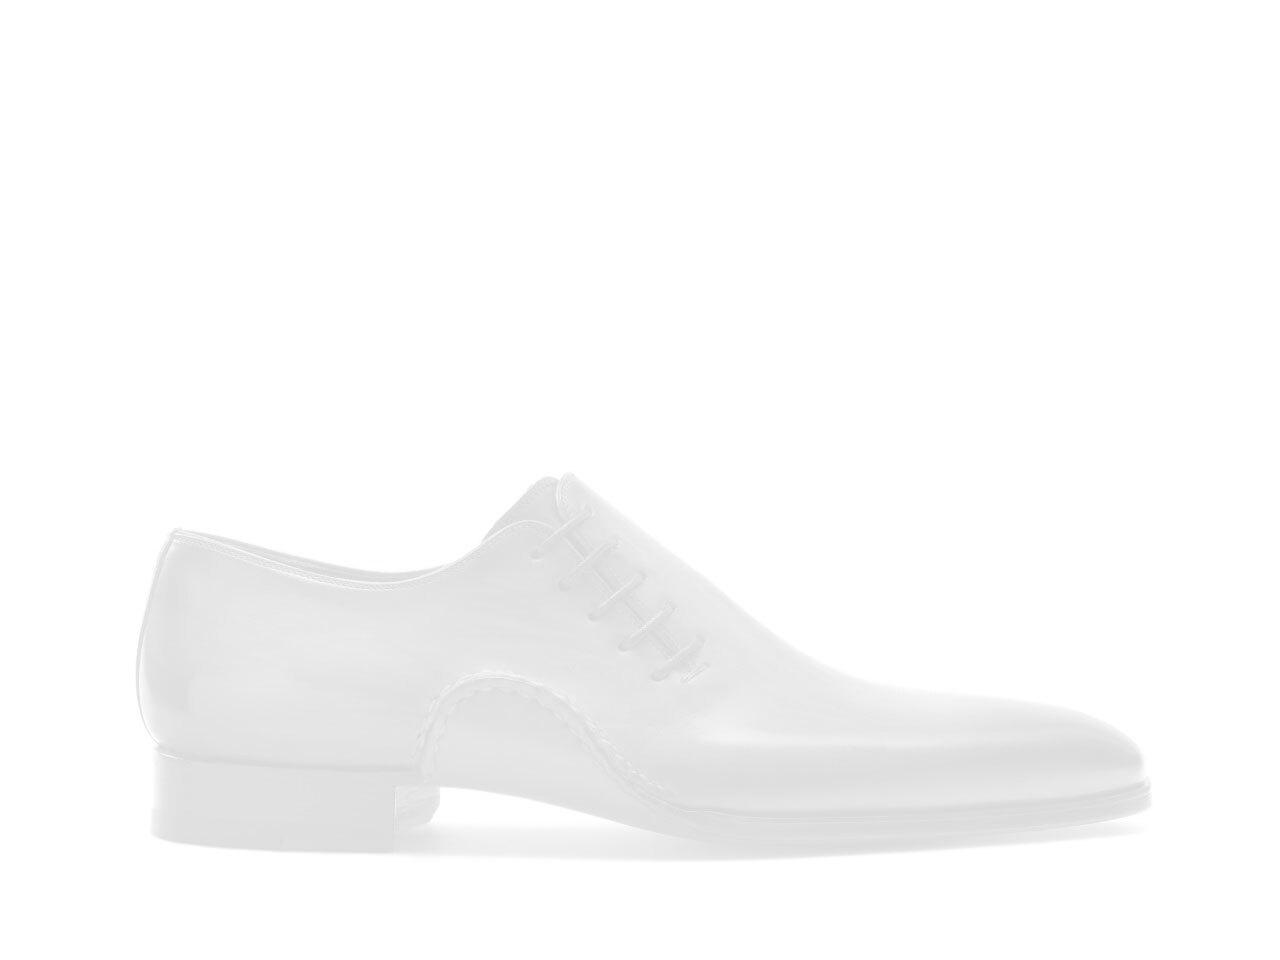 Pair of the Magnanni Jairo Navy Men's Sneakers